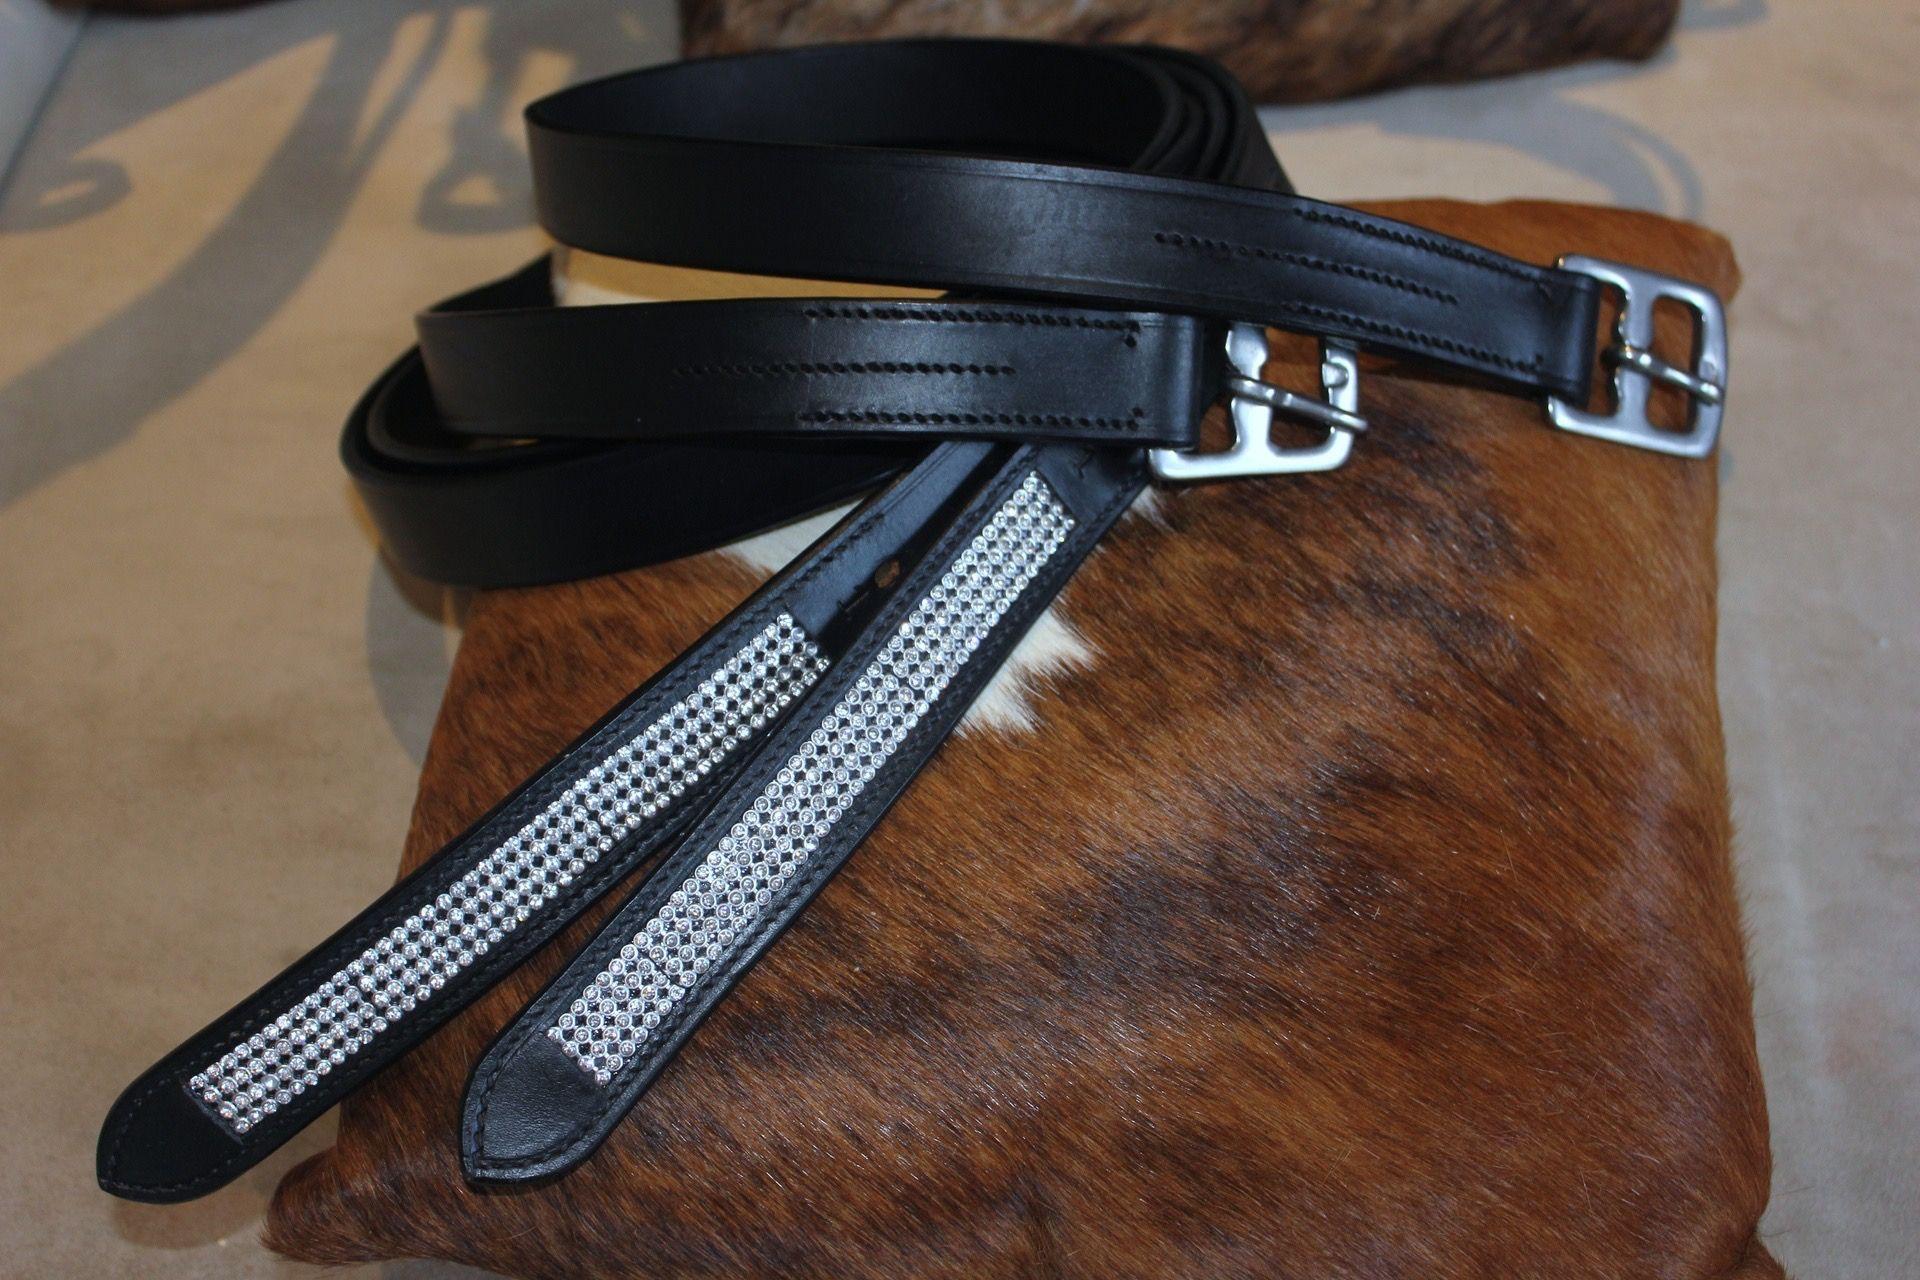 Bling Black Leather Stirrup leathers $49.95 plus $7.50 post. www.northcoasttackshop.com